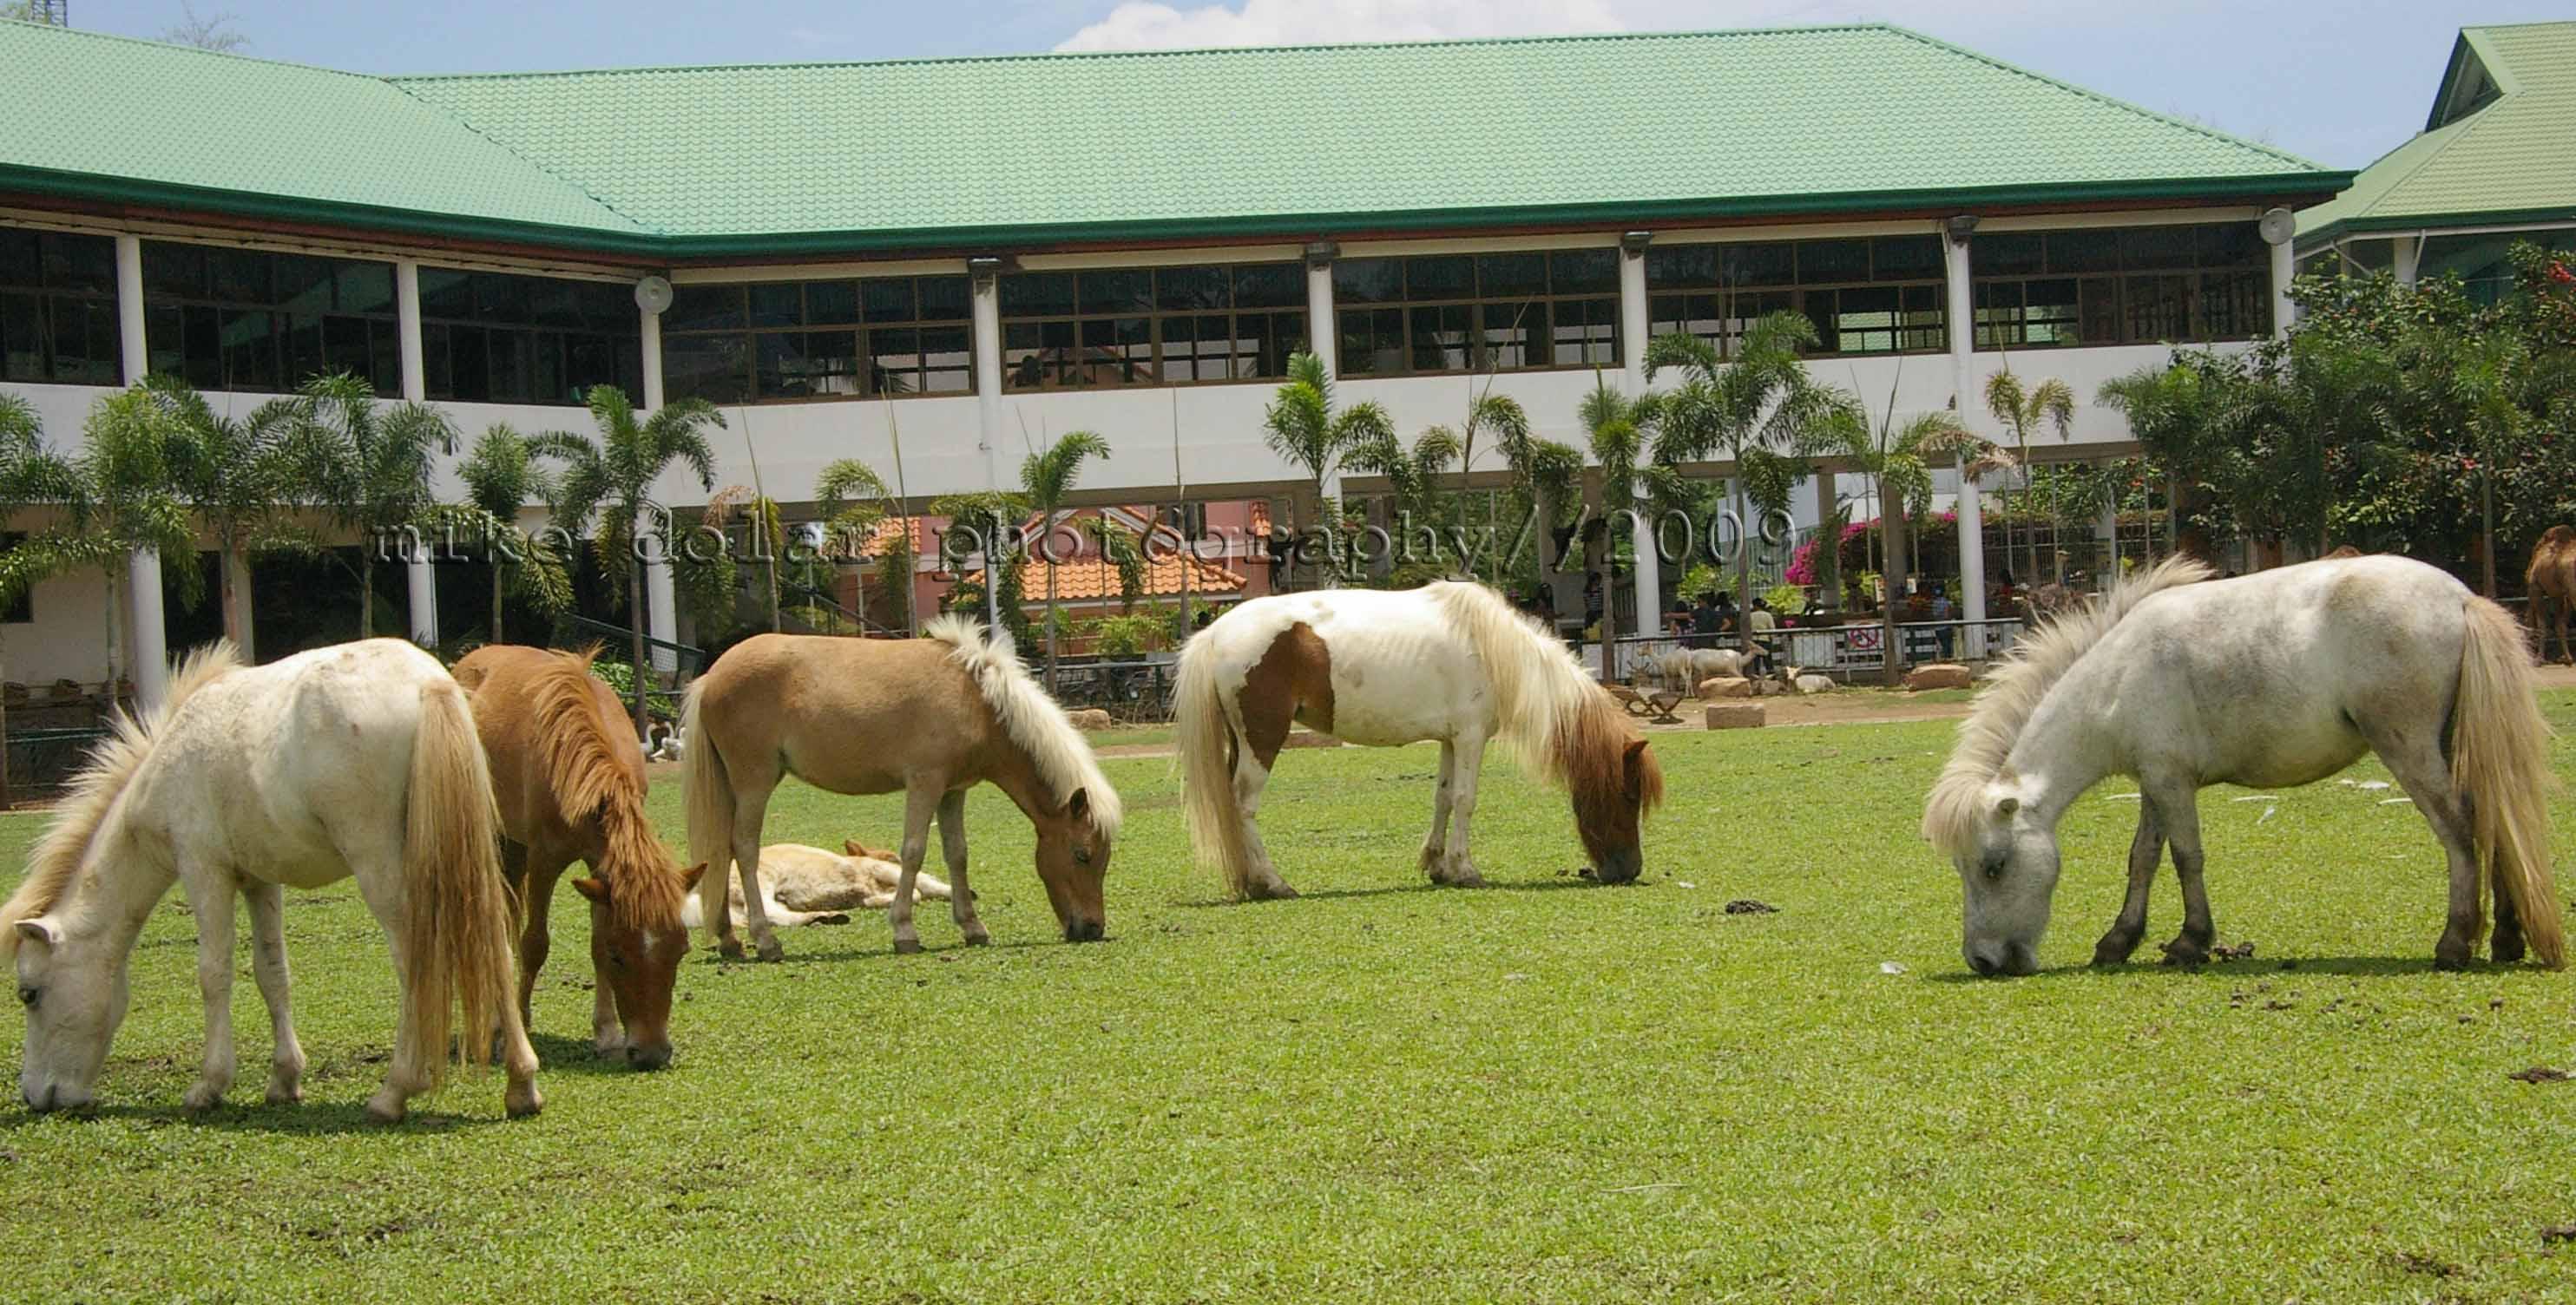 mini horses grazing at the grass